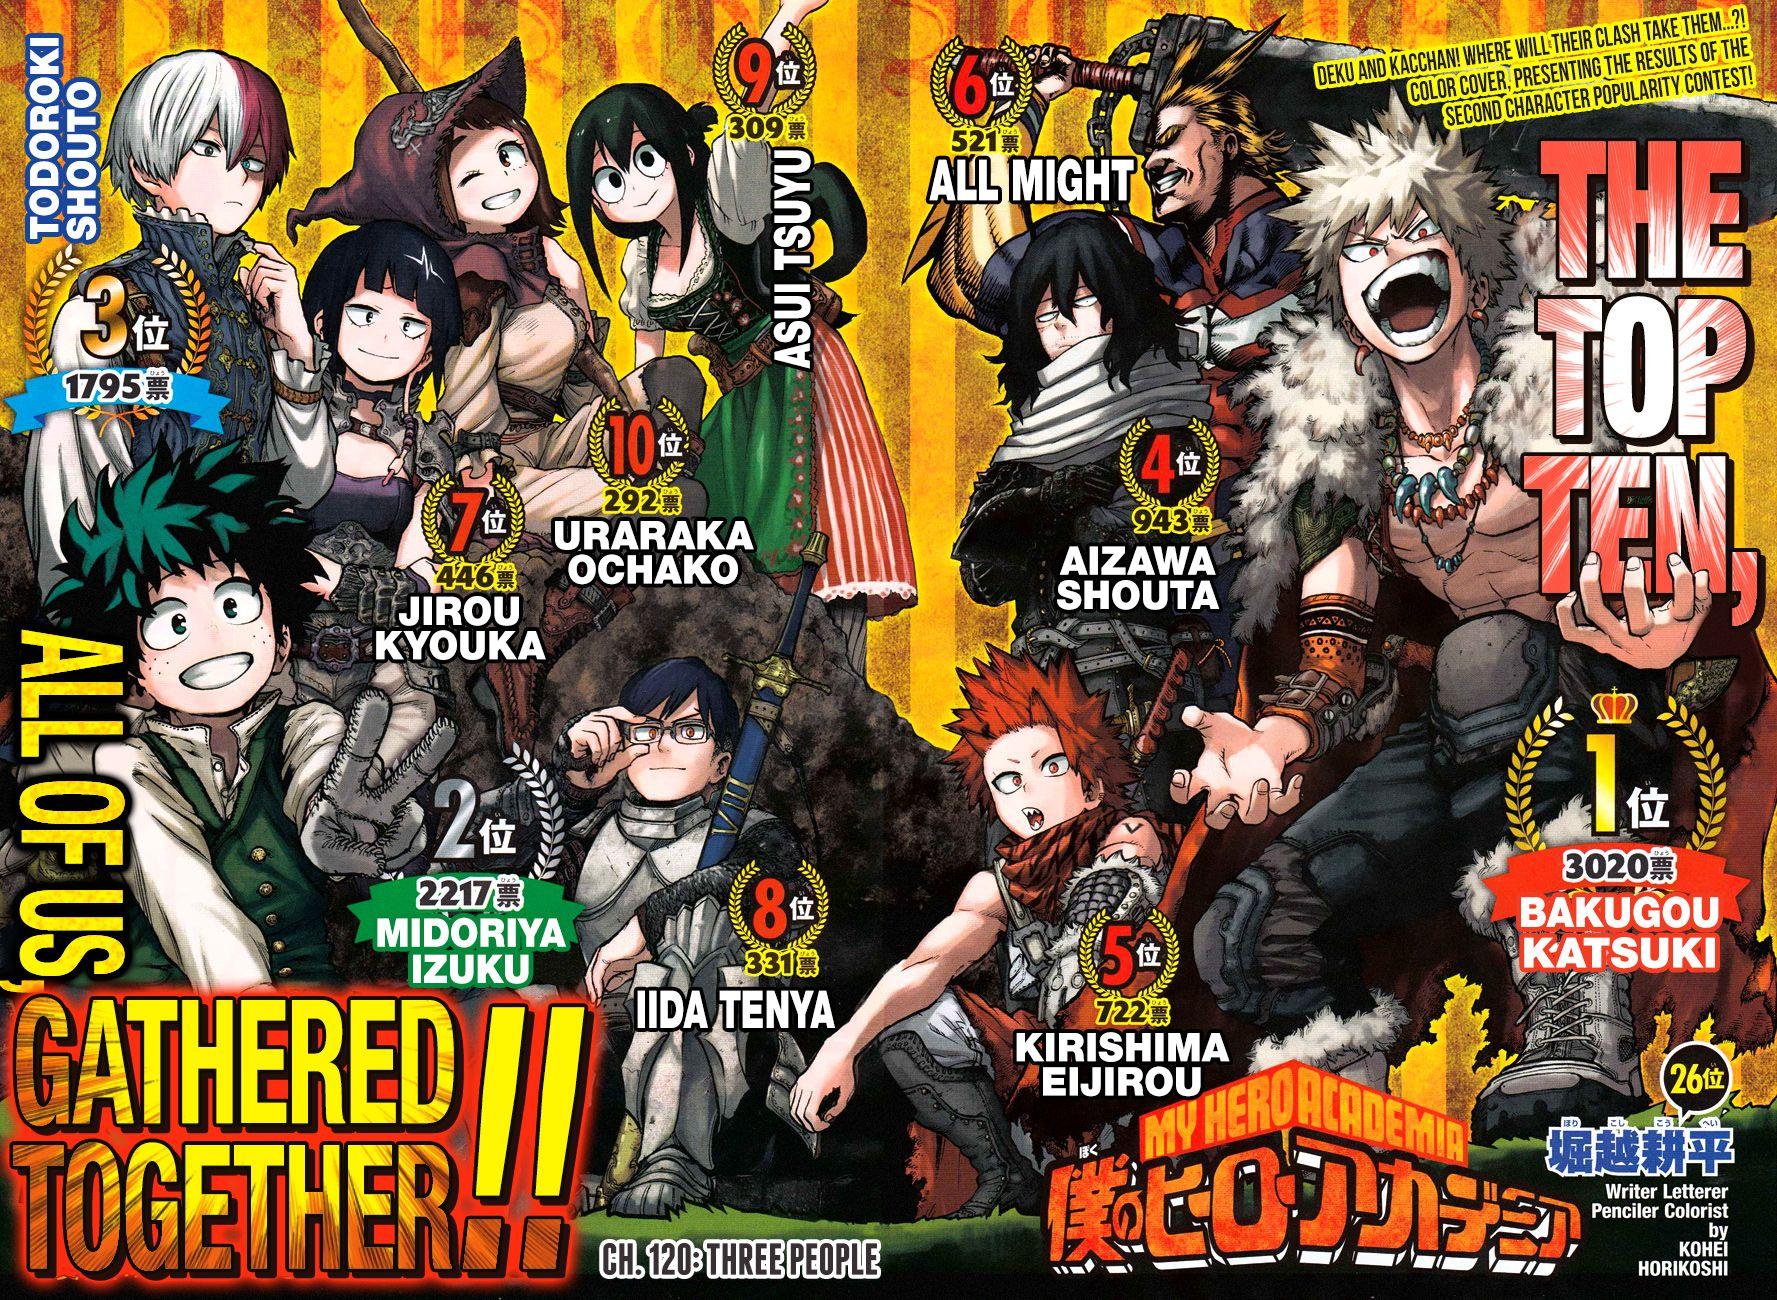 My Hero Academia 120 - Page 3 - Manga Stream